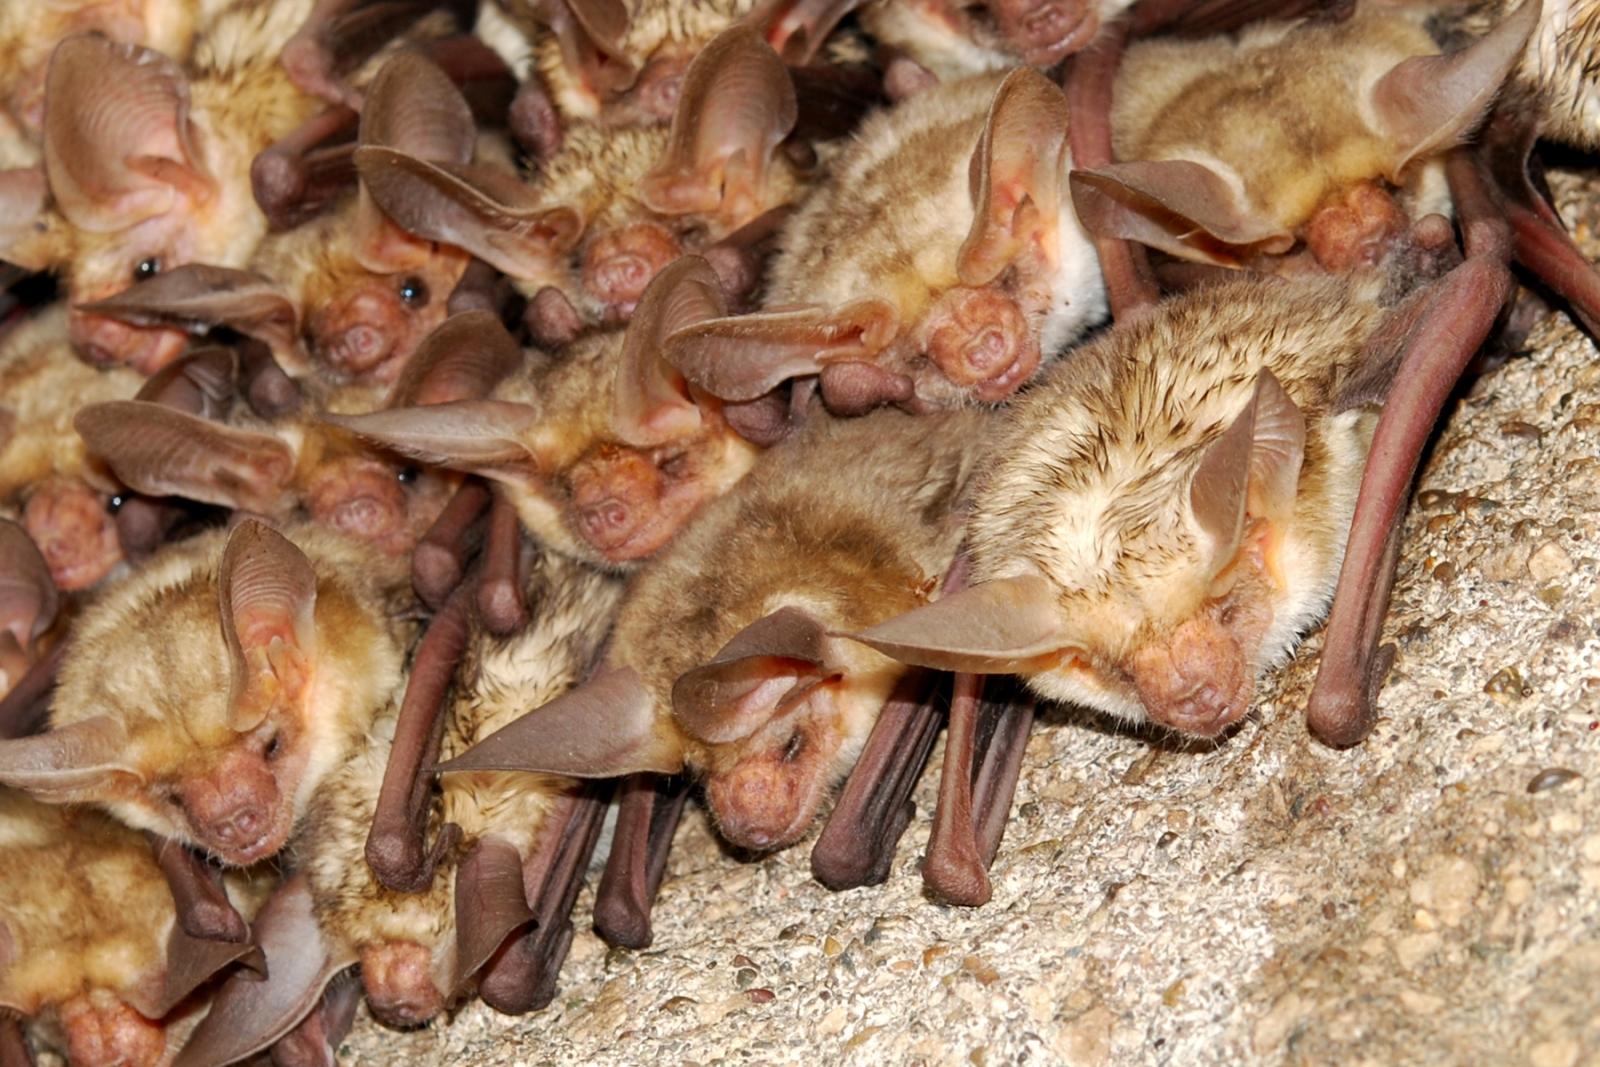 Pallid bats